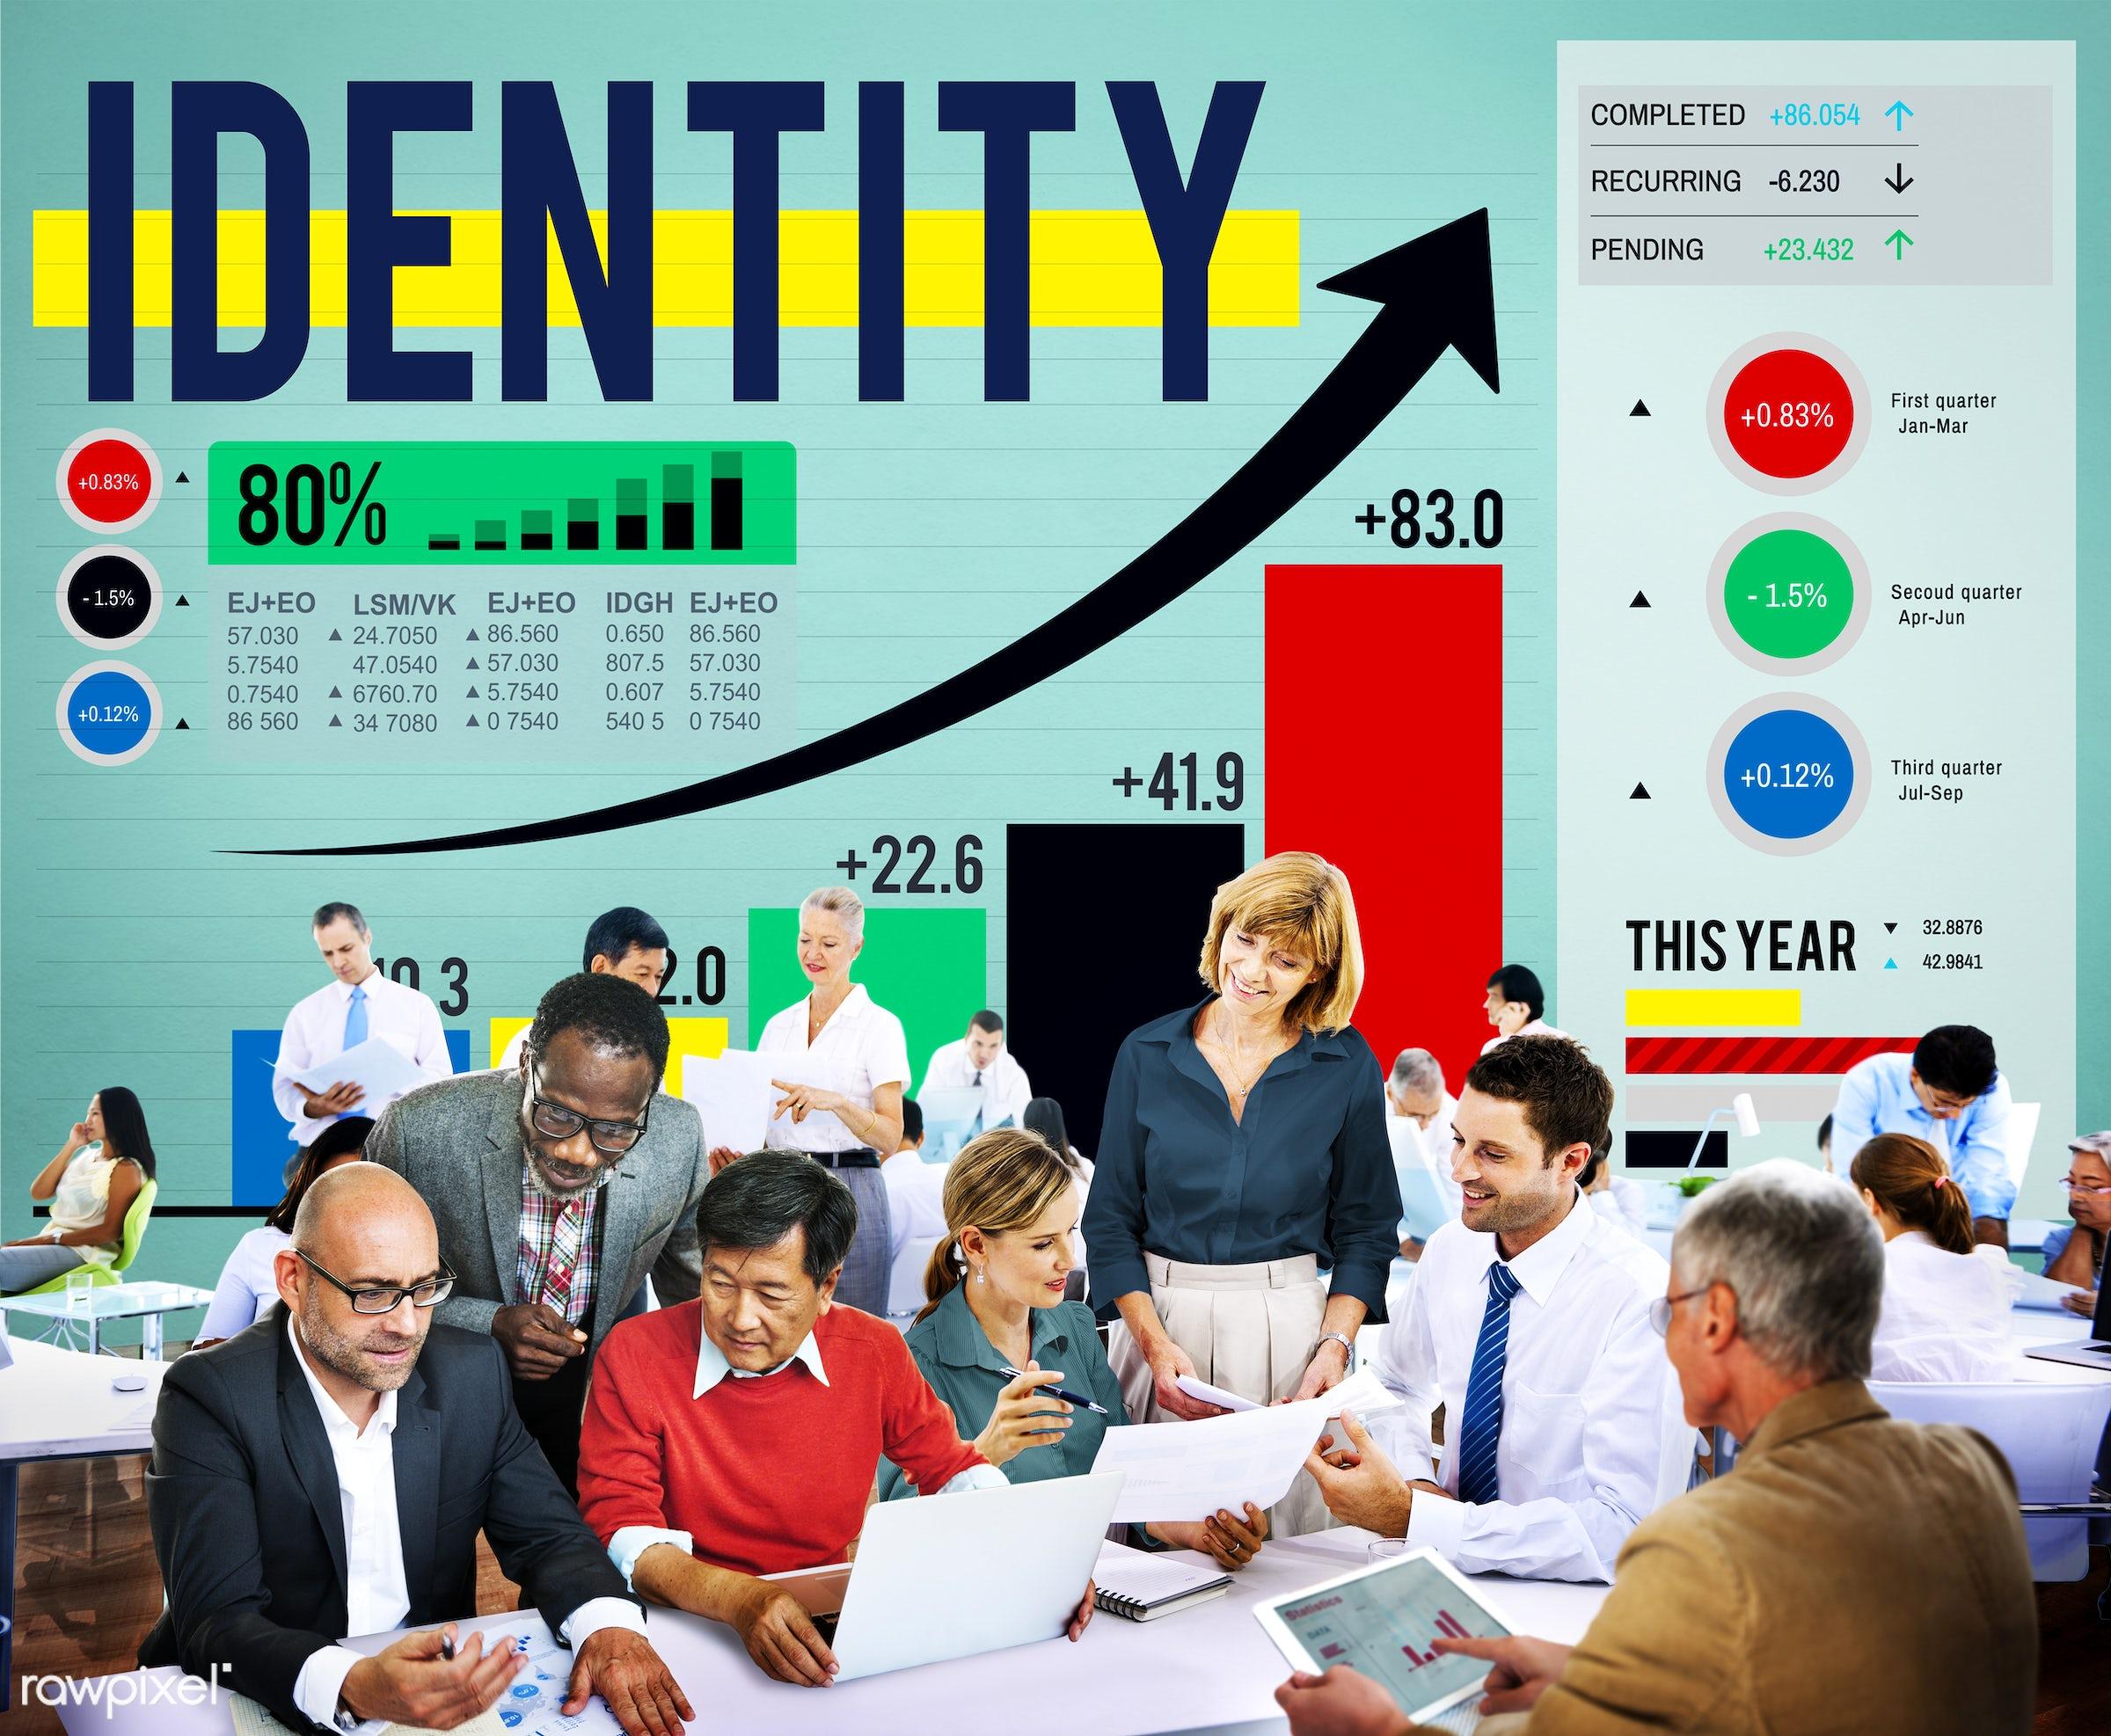 analysis, bar graph, brand, brand name, branding, business, business people, businessmen, businesswomen, chart, commercial,...